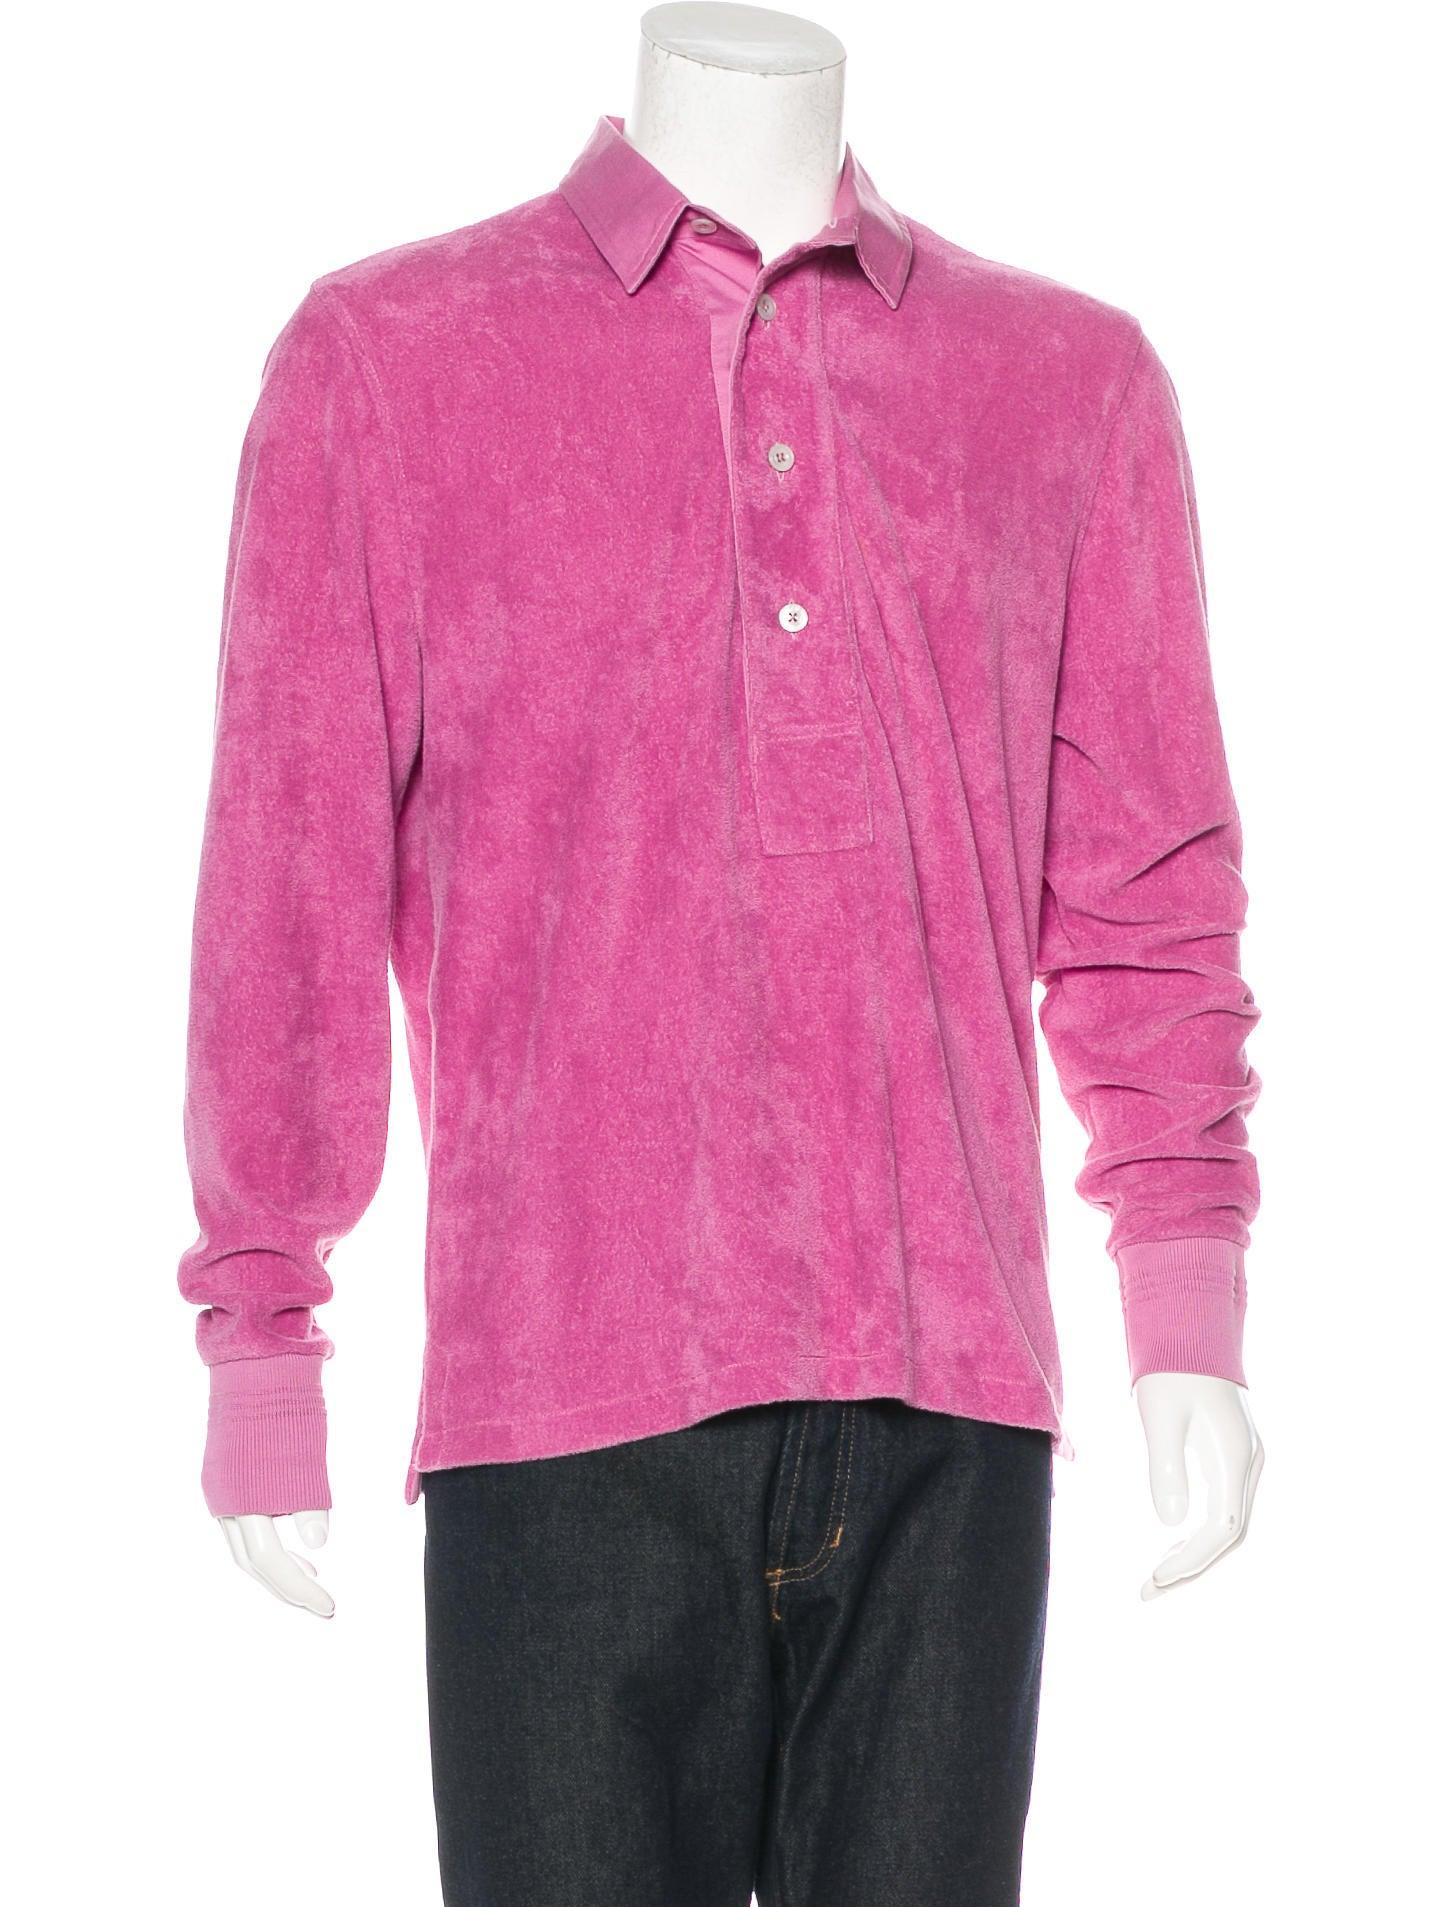 Tom ford terry cloth polo shirt clothing tom40314 for Terry cloth polo shirt